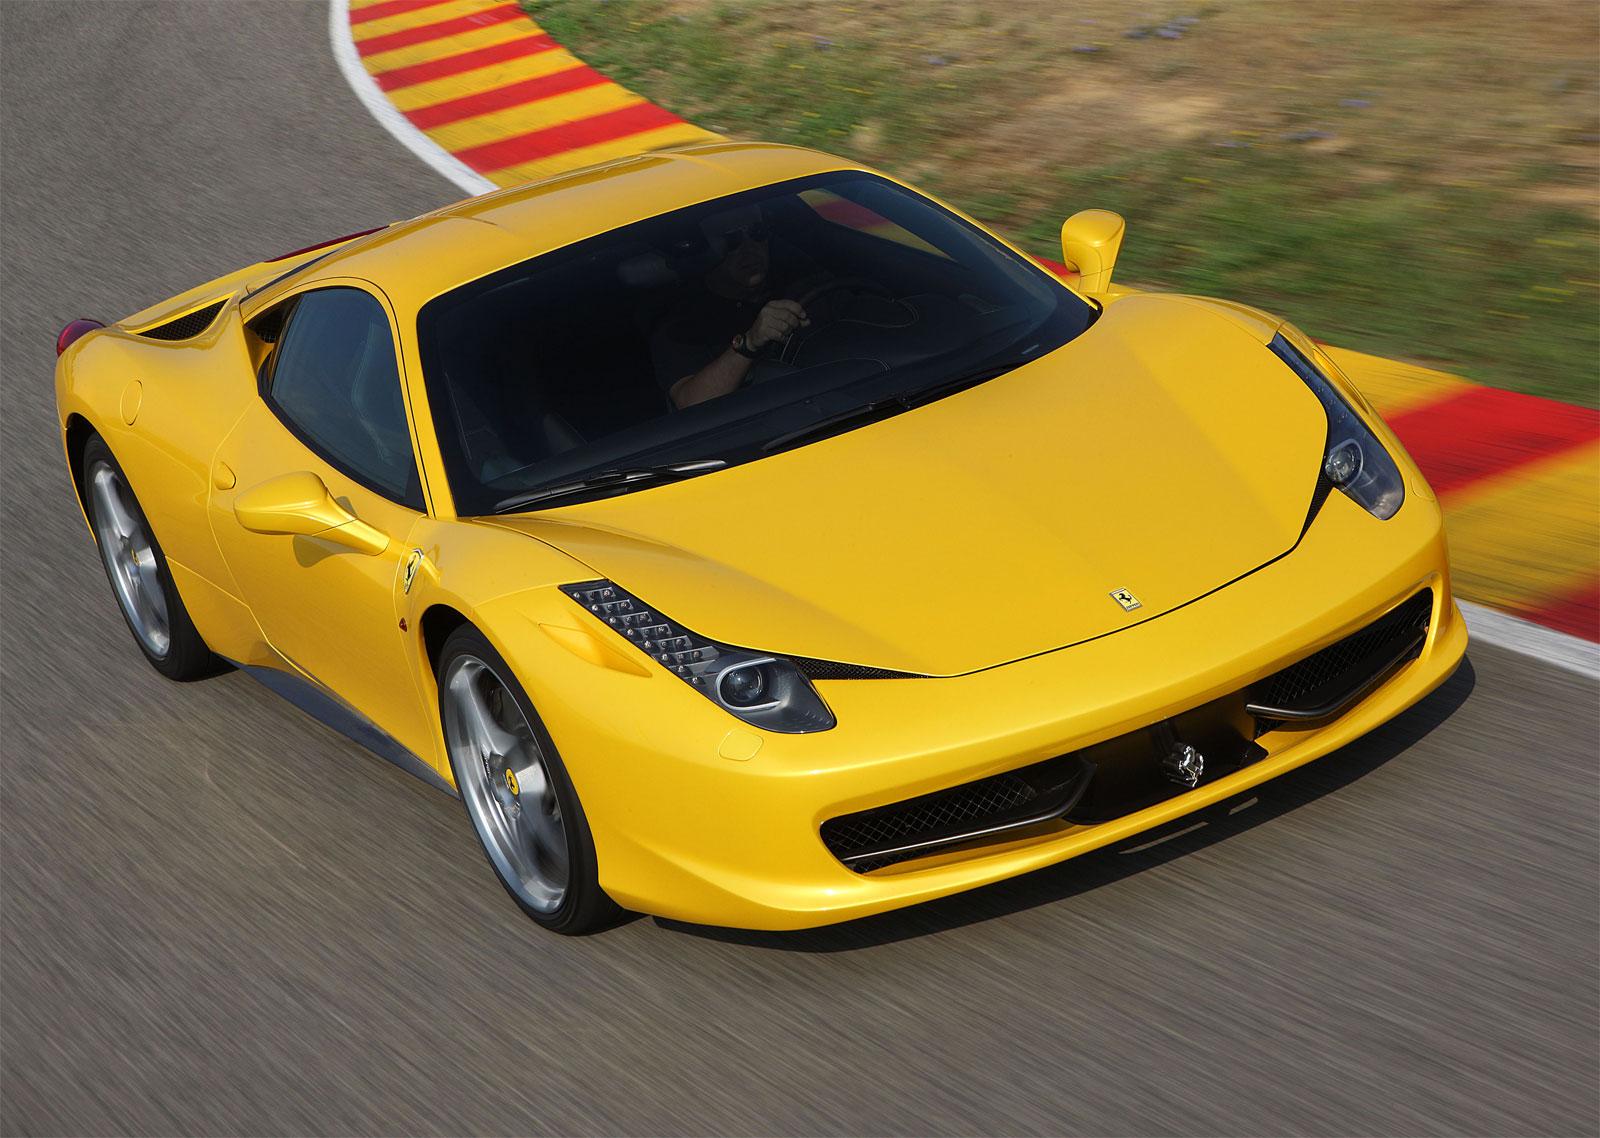 Sport Cars Ferrari 458 Italia Hd Wallpapers 2011